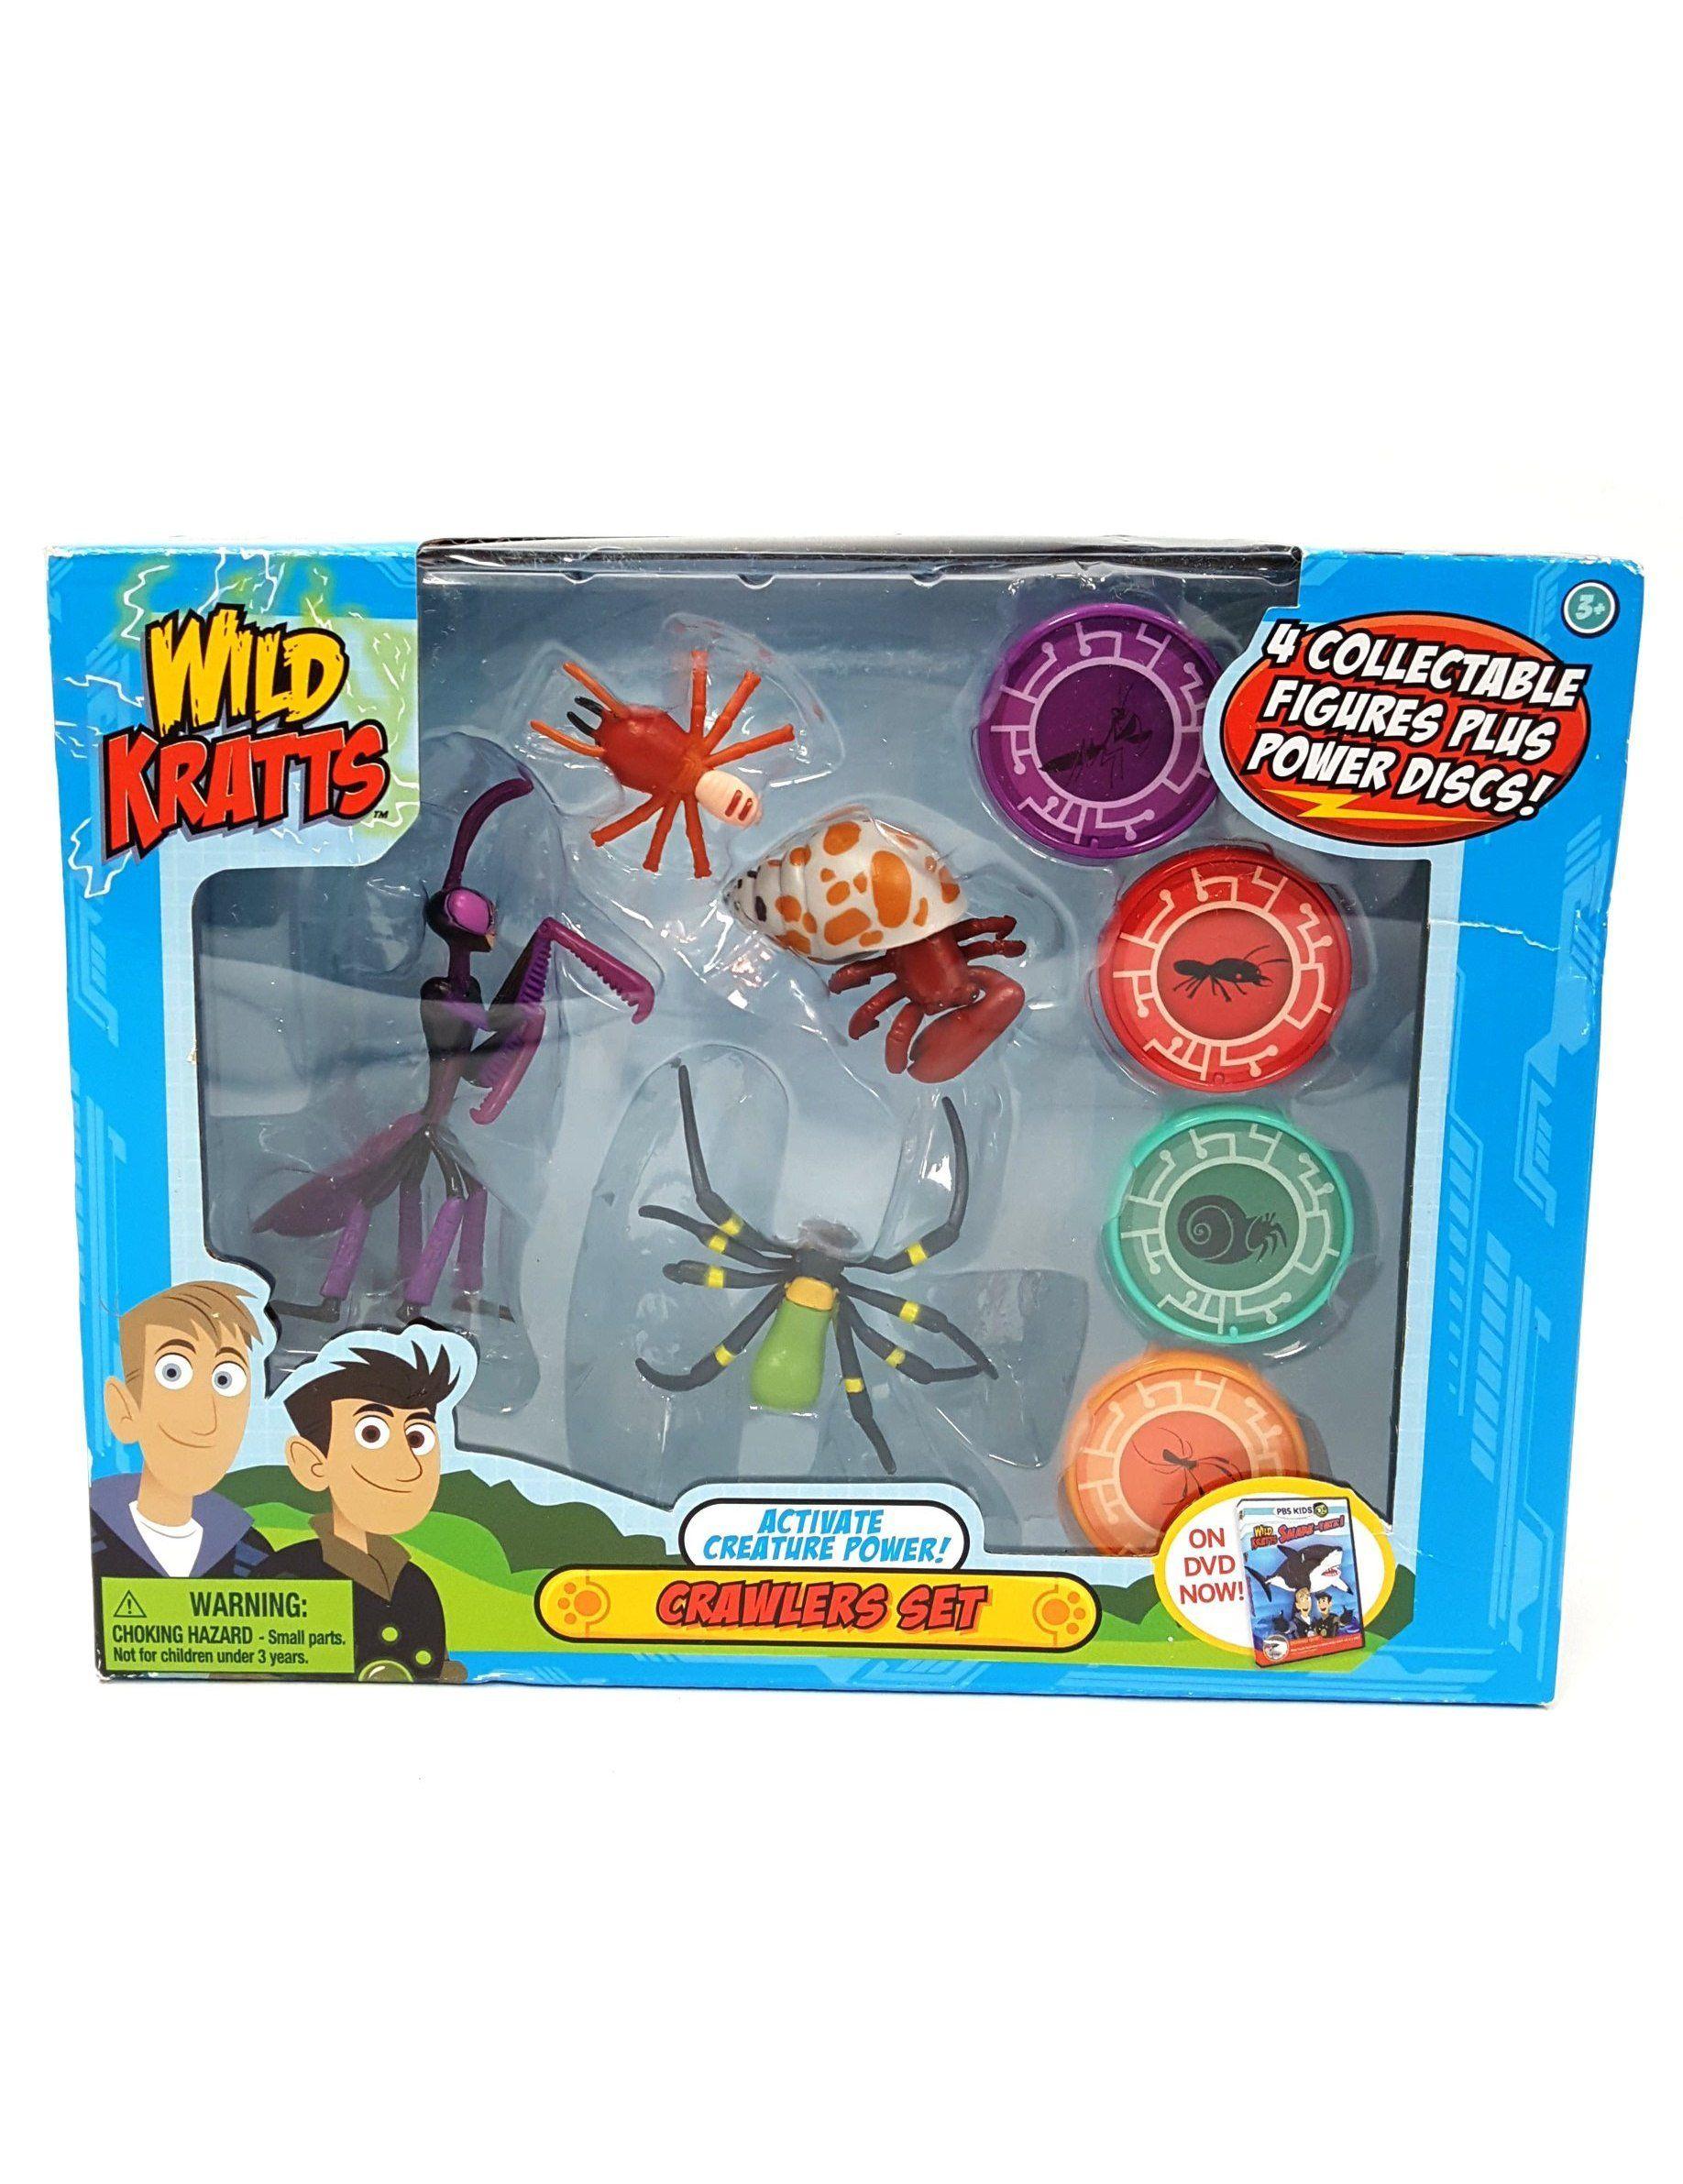 Elephant Wild Kratts Toys 2 Pack Creature Power Action Figure Set